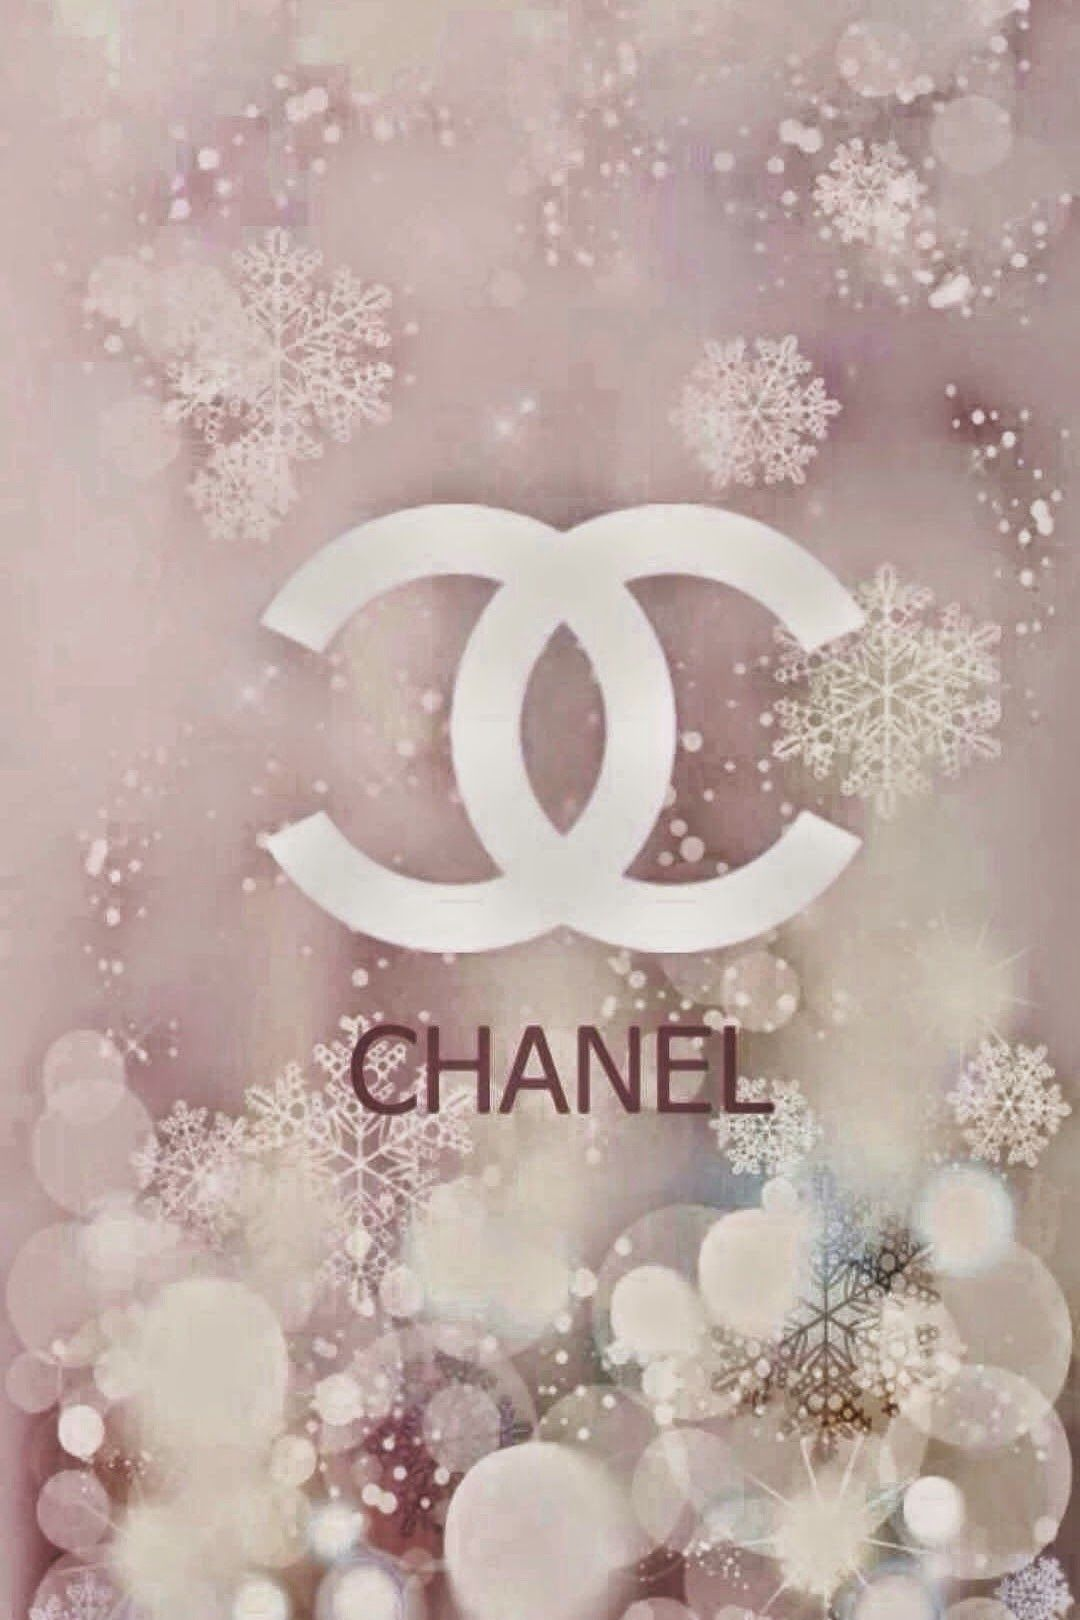 Chanel Wallpaper Chanel Wallpapers Pretty Wallpapers Chanel Art Print